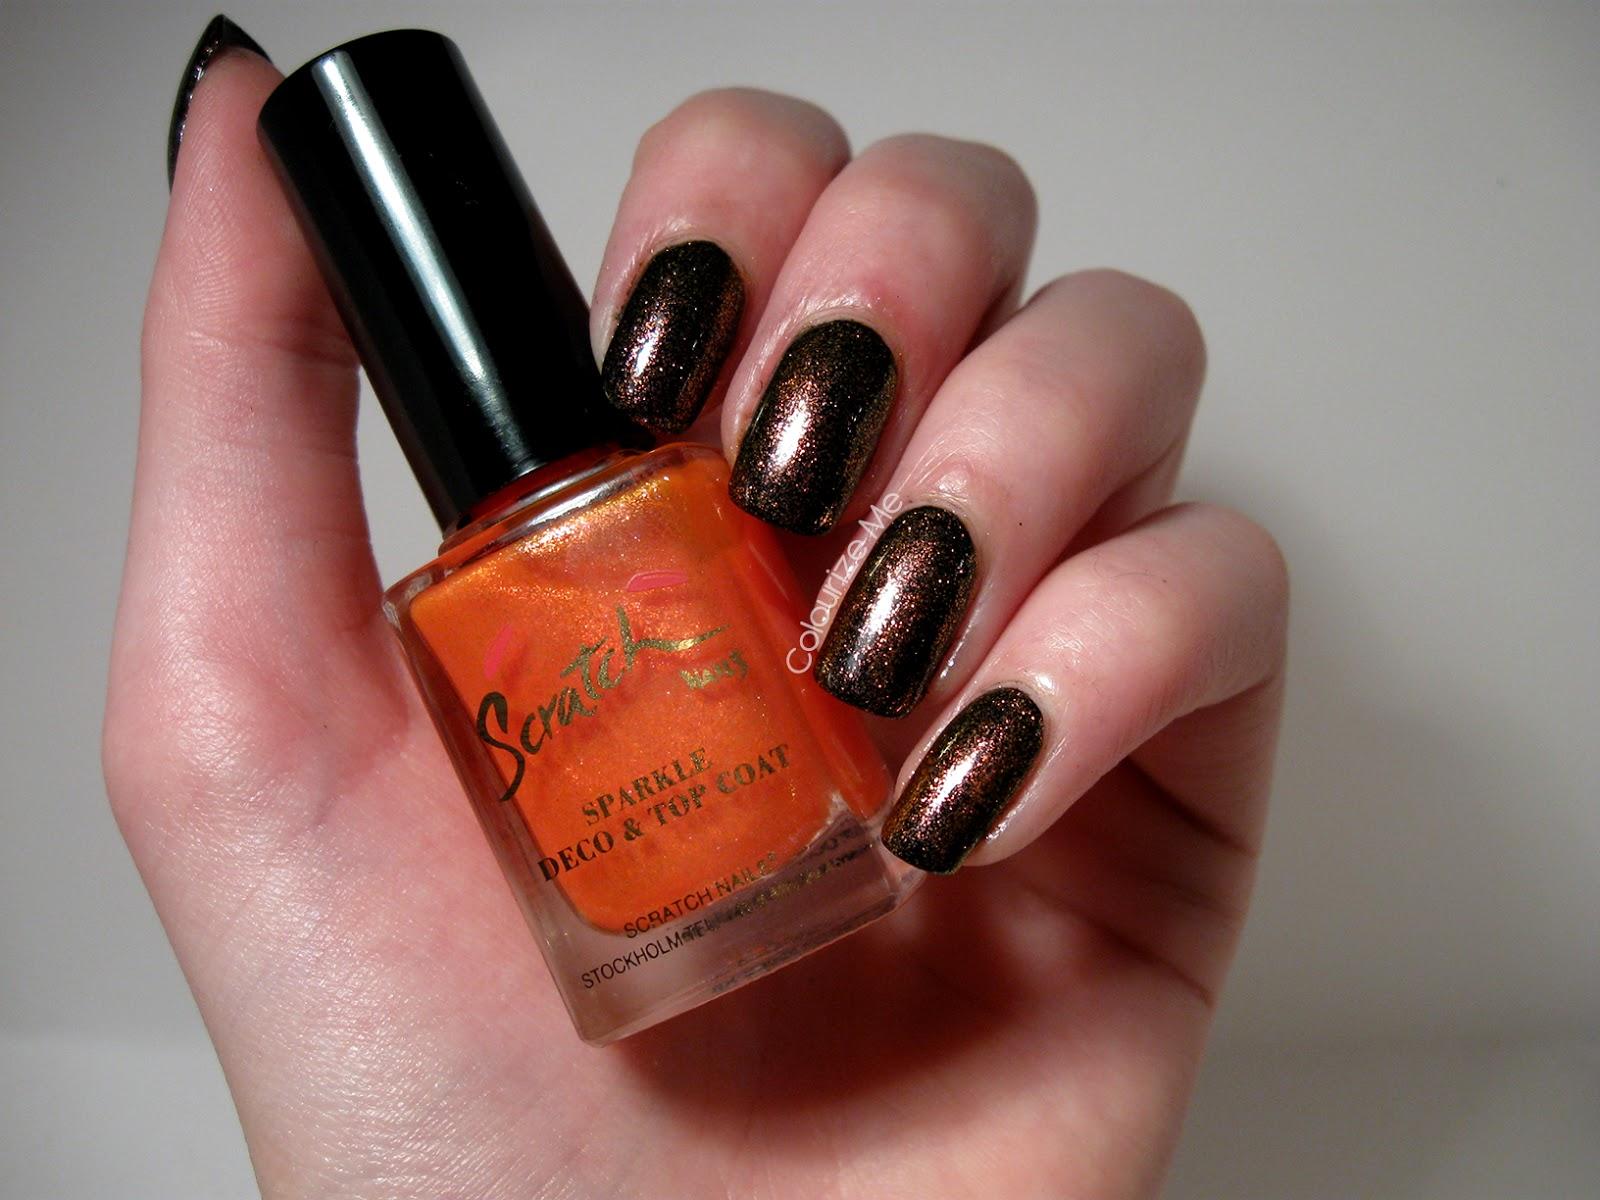 Colourize Me: Nail Polish Spam